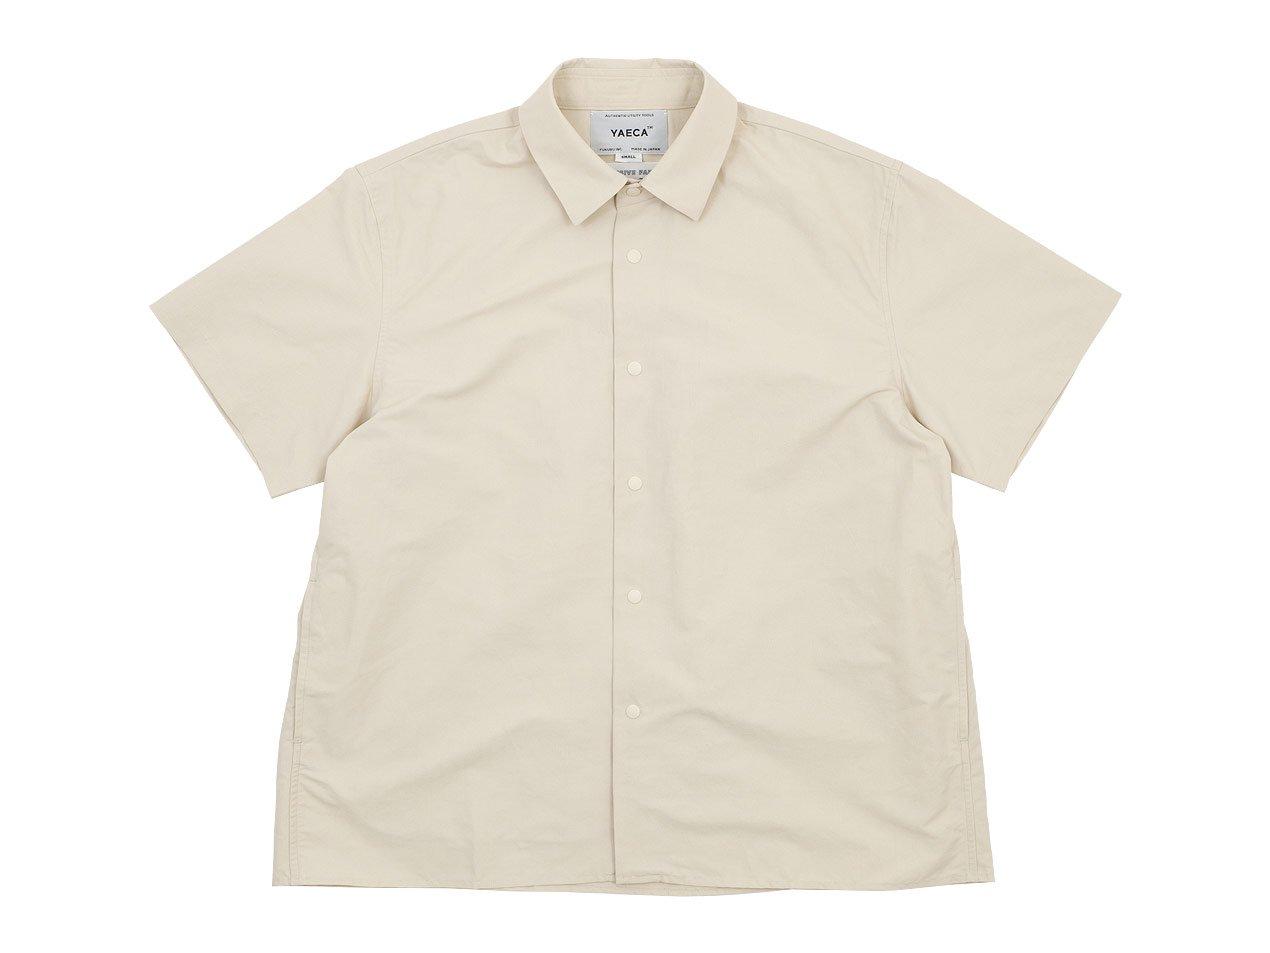 YAECA コンフォートシャツ 半袖 BEIGE 〔レディース〕